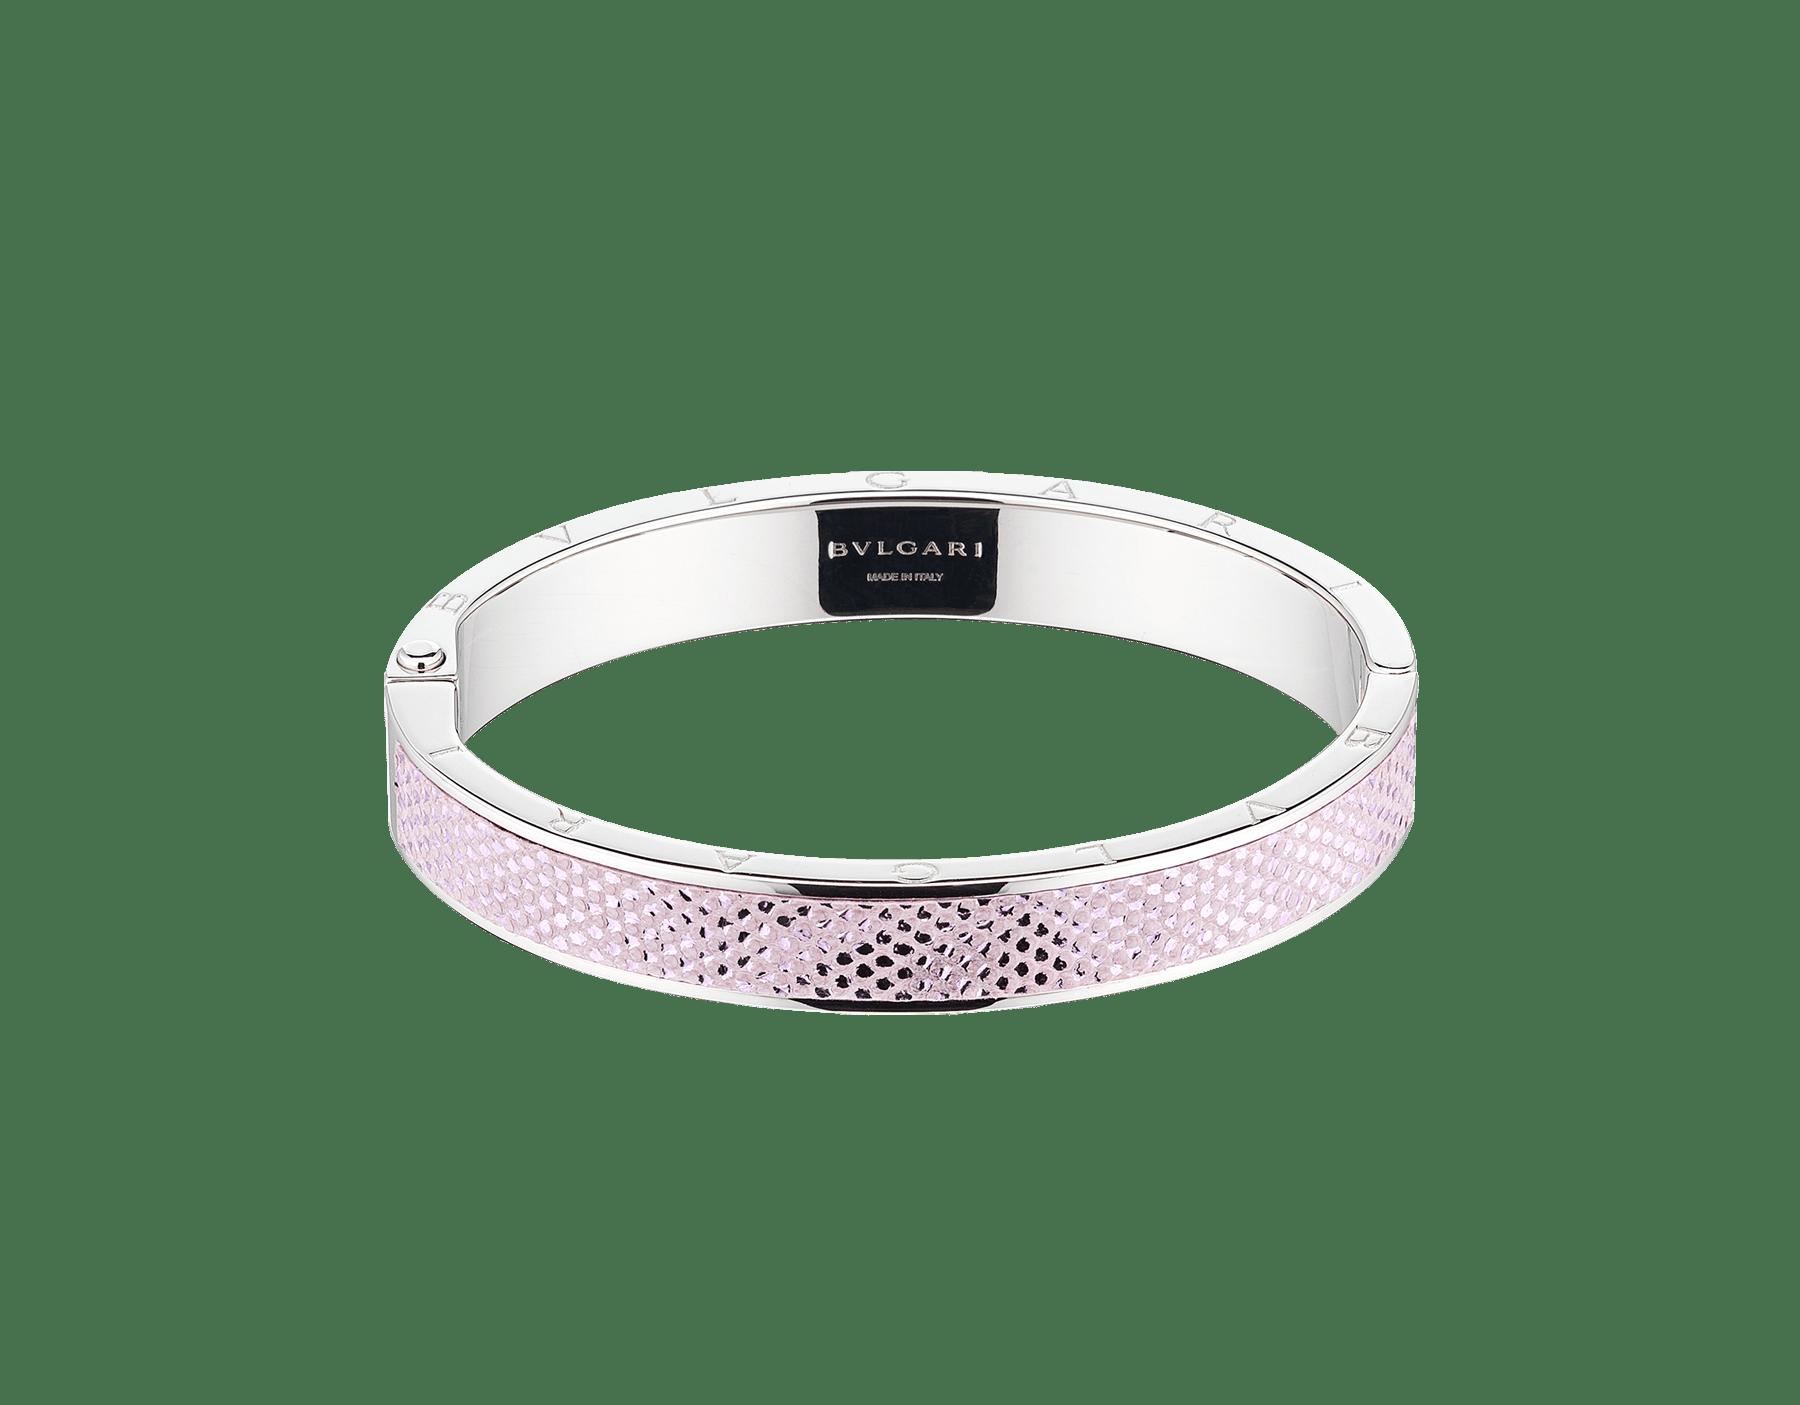 """BVLGARI BVLGARI"" bangle bracelet in palladium-plated brass with a Rosa di Francia pink metallic karung skin insert and a BVLGARI logo hinge closure. Logo engraving along the edges of both sides of the bracelet and in the inner part. HINGELOGOBRACLT-MK-RdF image 1"